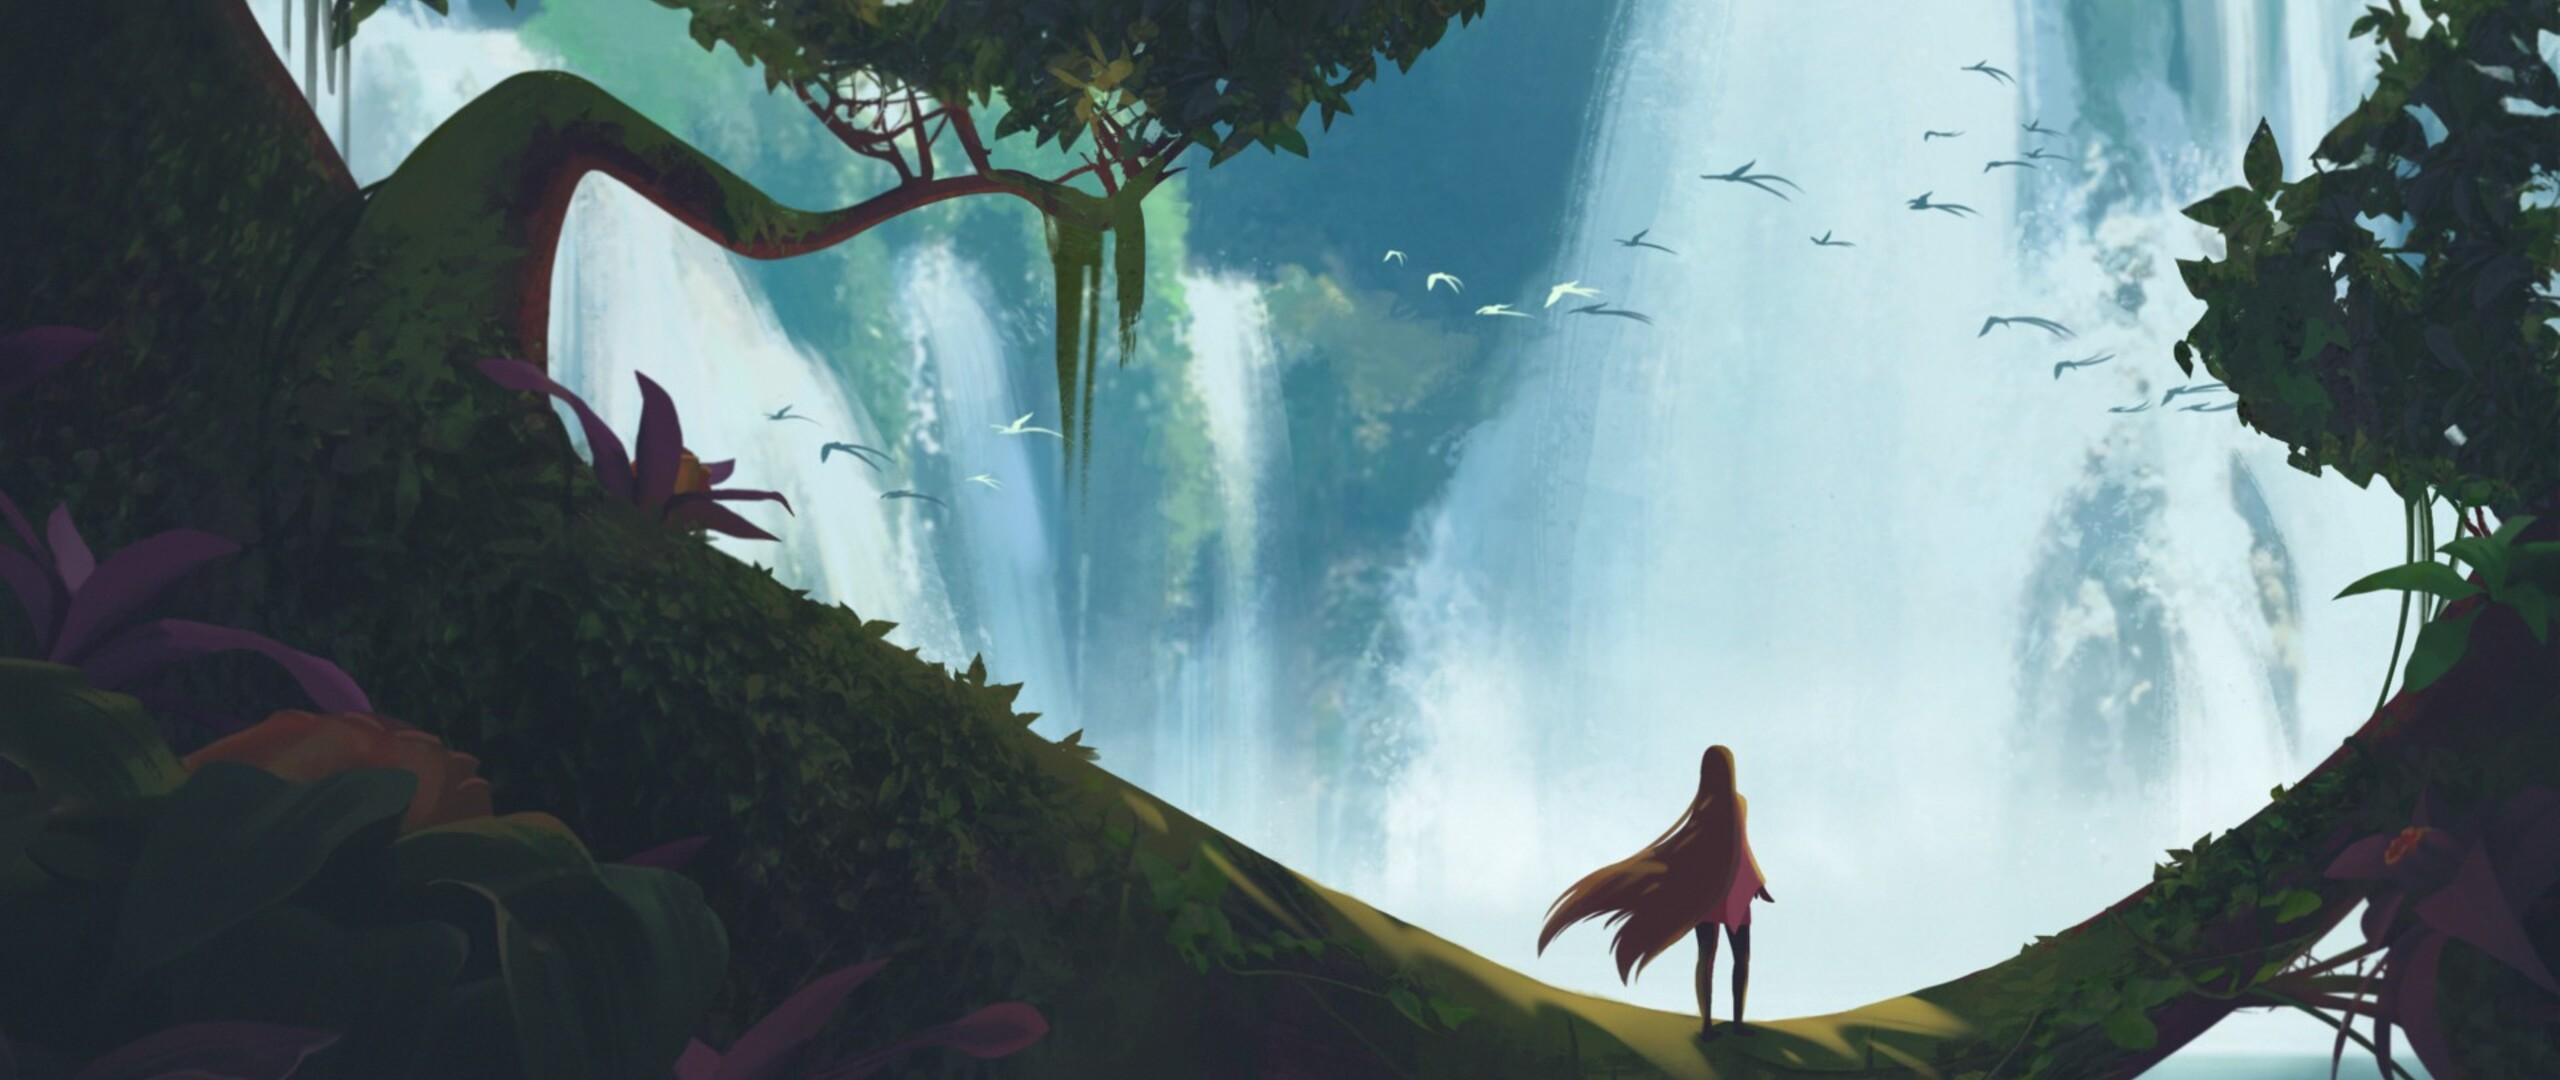 2560x1080 Final Fantasy Xv Artwork 2560x1080 Resolution Hd: 2560x1080 Girl Waterfall Fantasy Art 2560x1080 Resolution